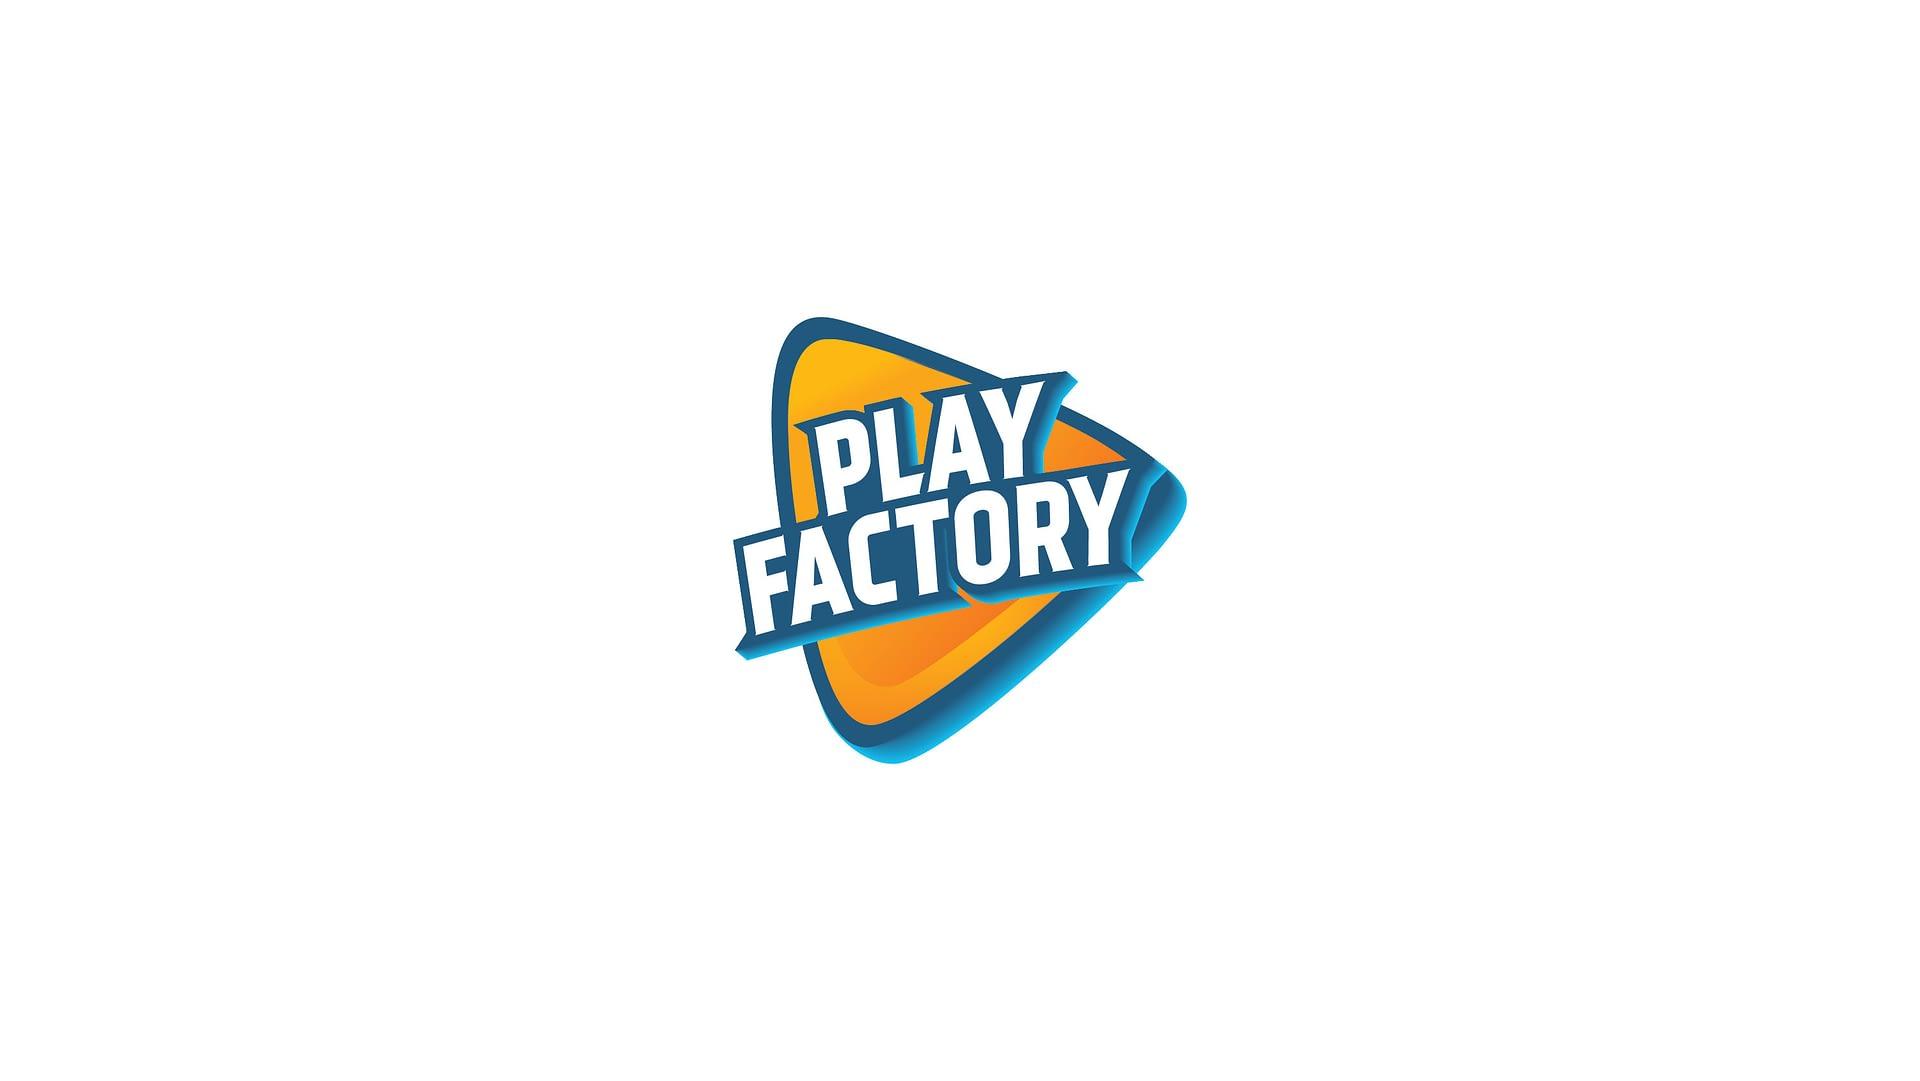 1 PLAYFCATORY